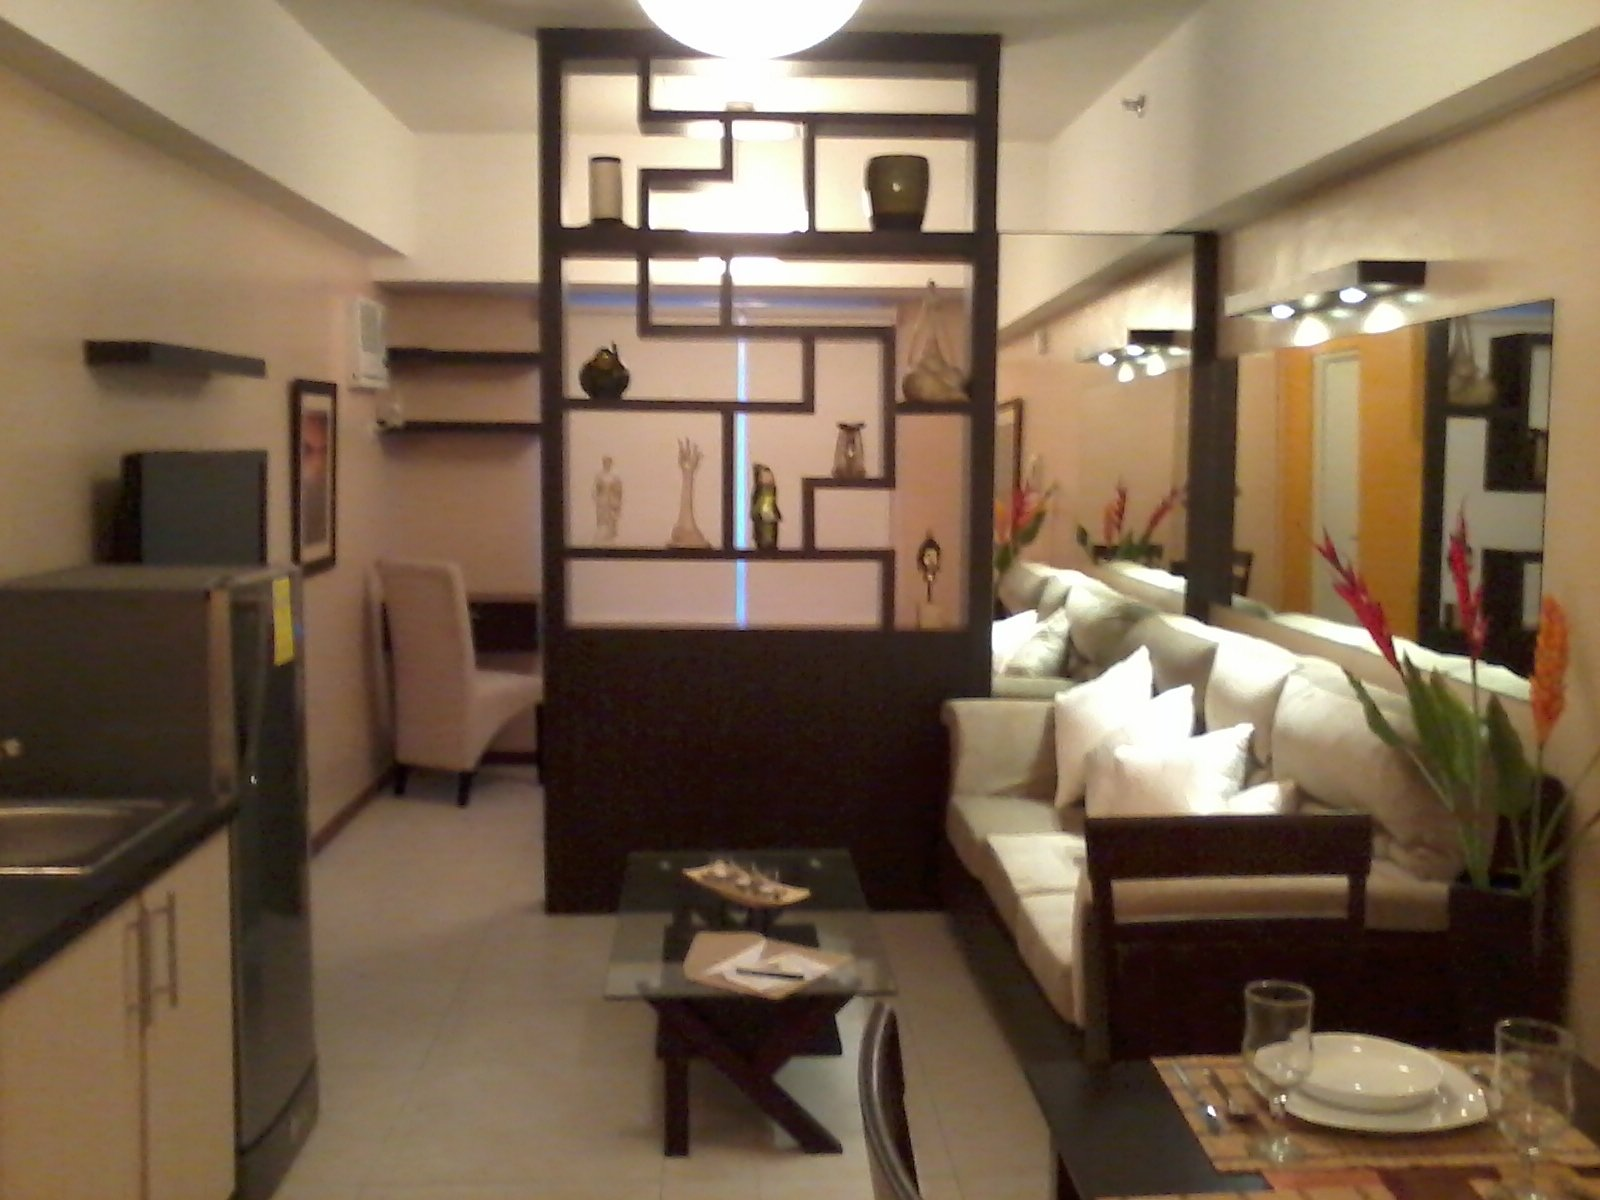 10 Gorgeous Interior Design Ideas For Small Spaces small space interior design amusing home interior design ideas for